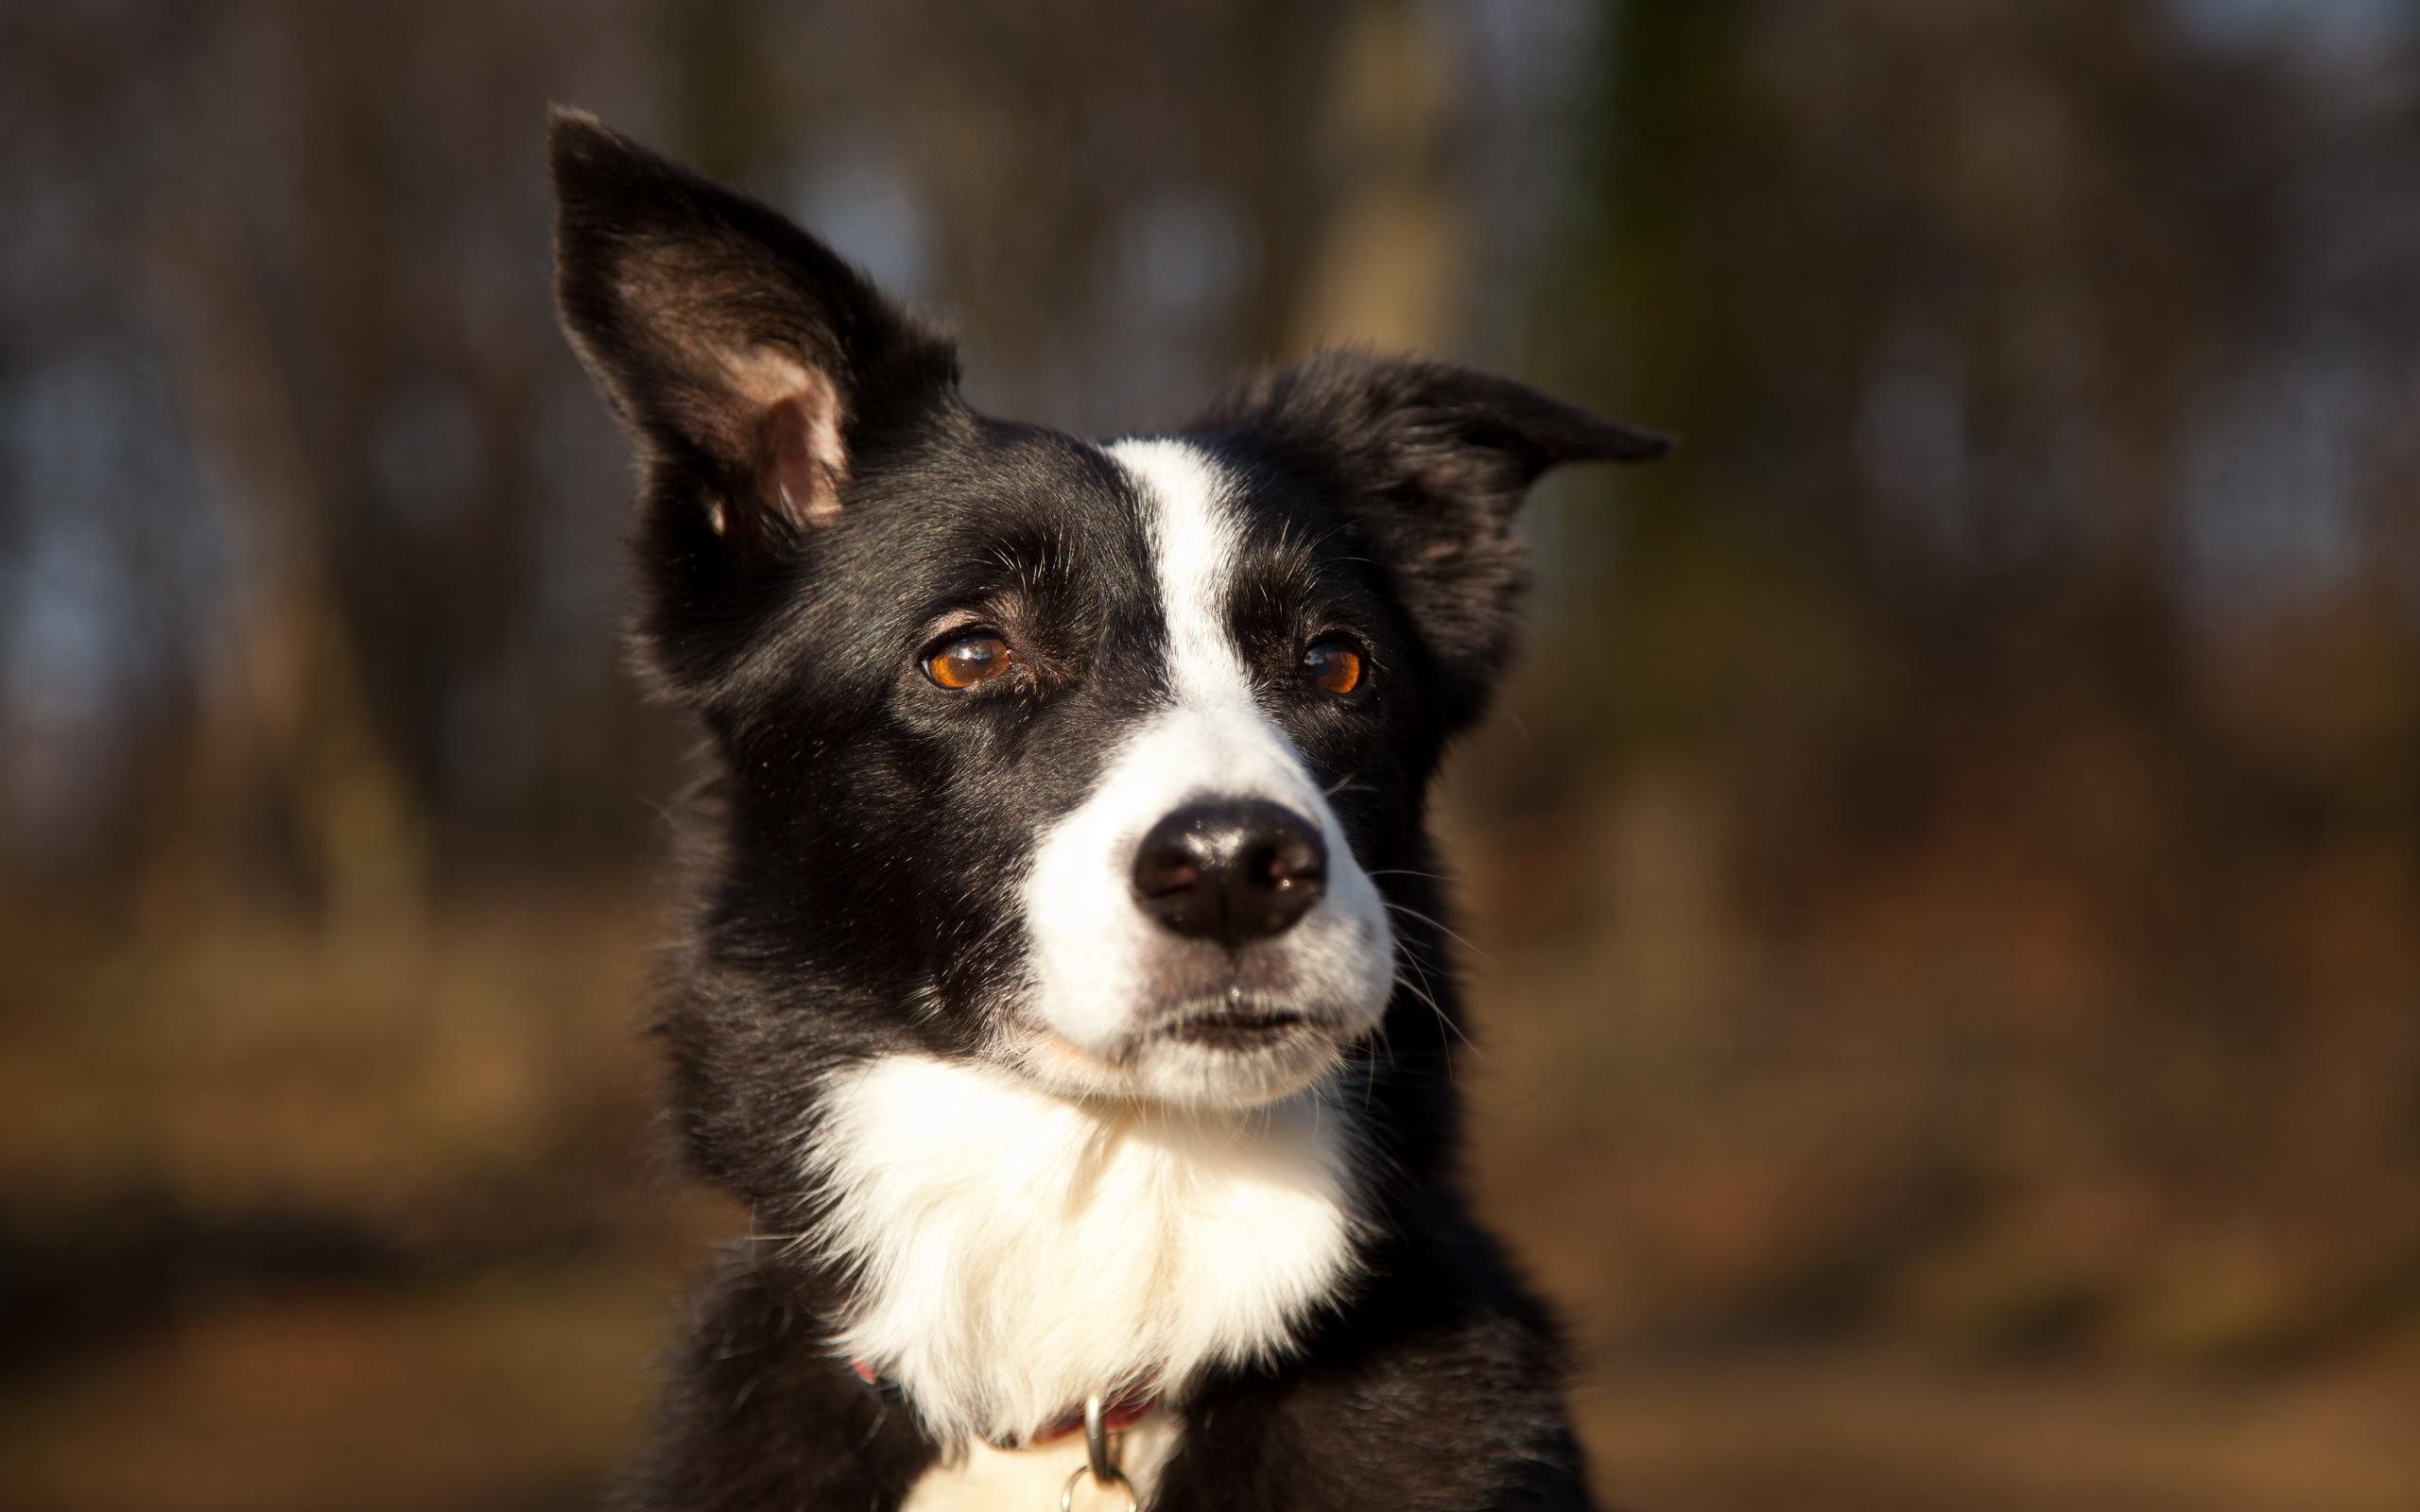 collie dog wallpaper background hd 49302